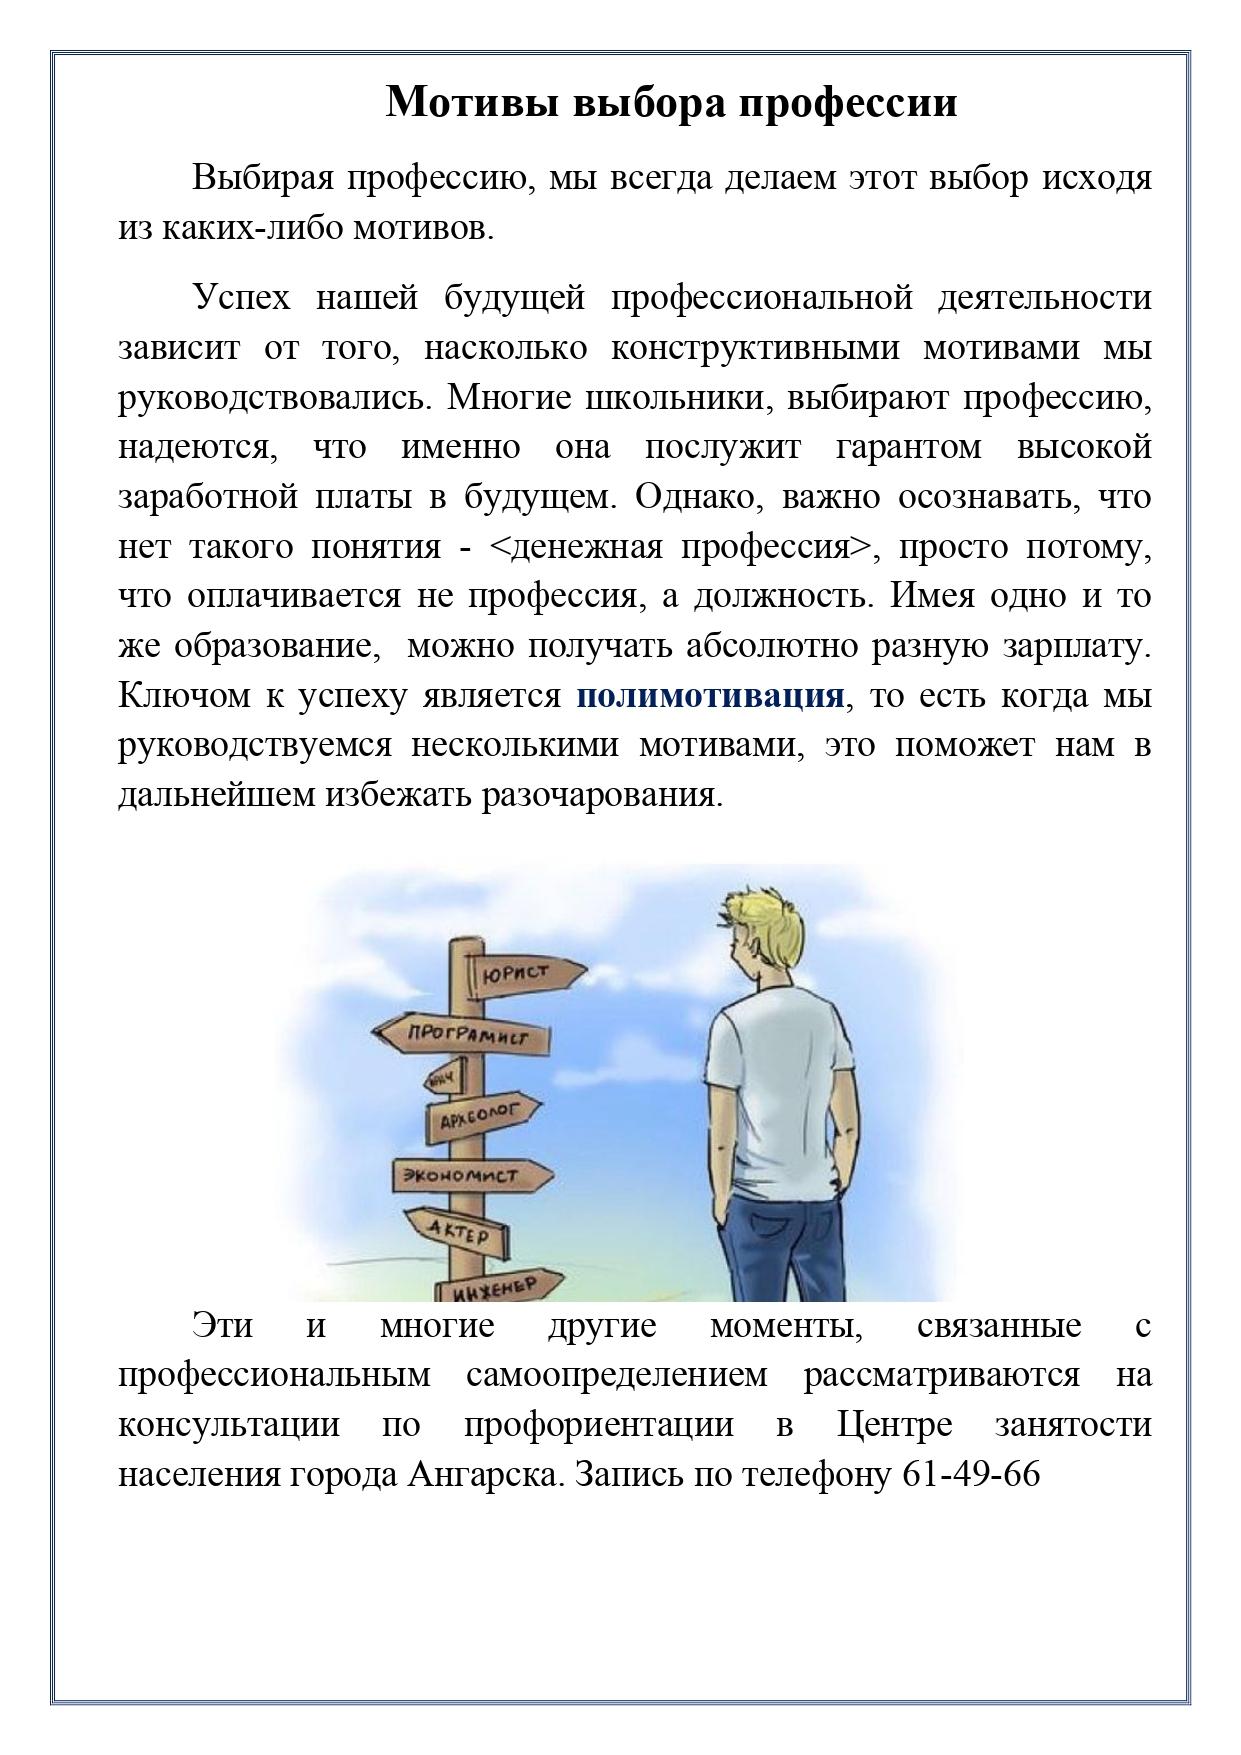 Мотивы выбора профессии_page-0001